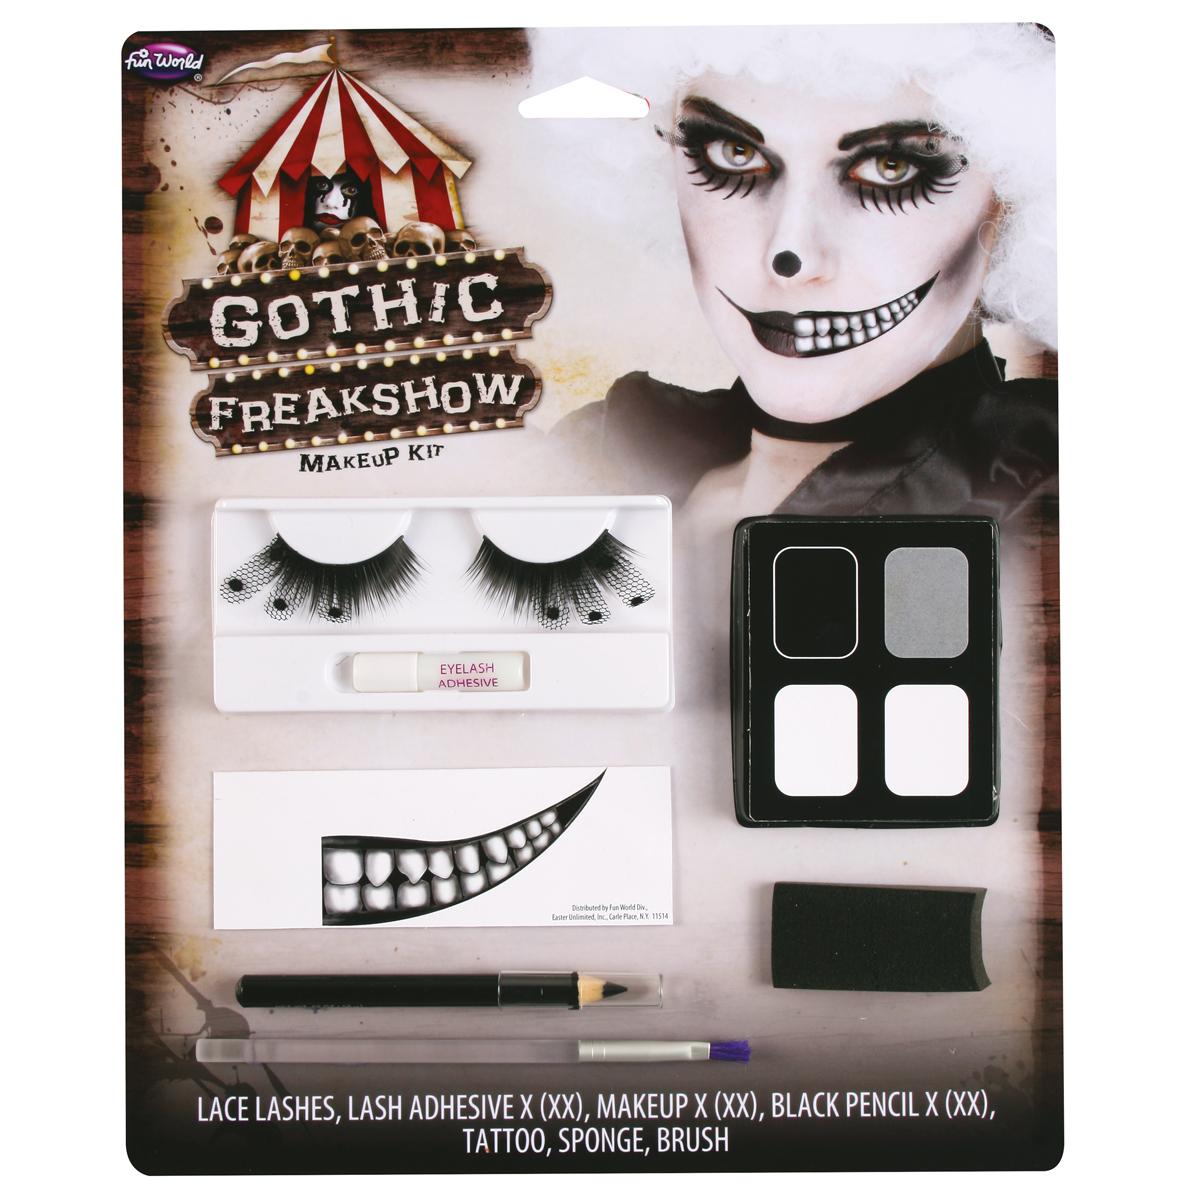 Freak show makeup